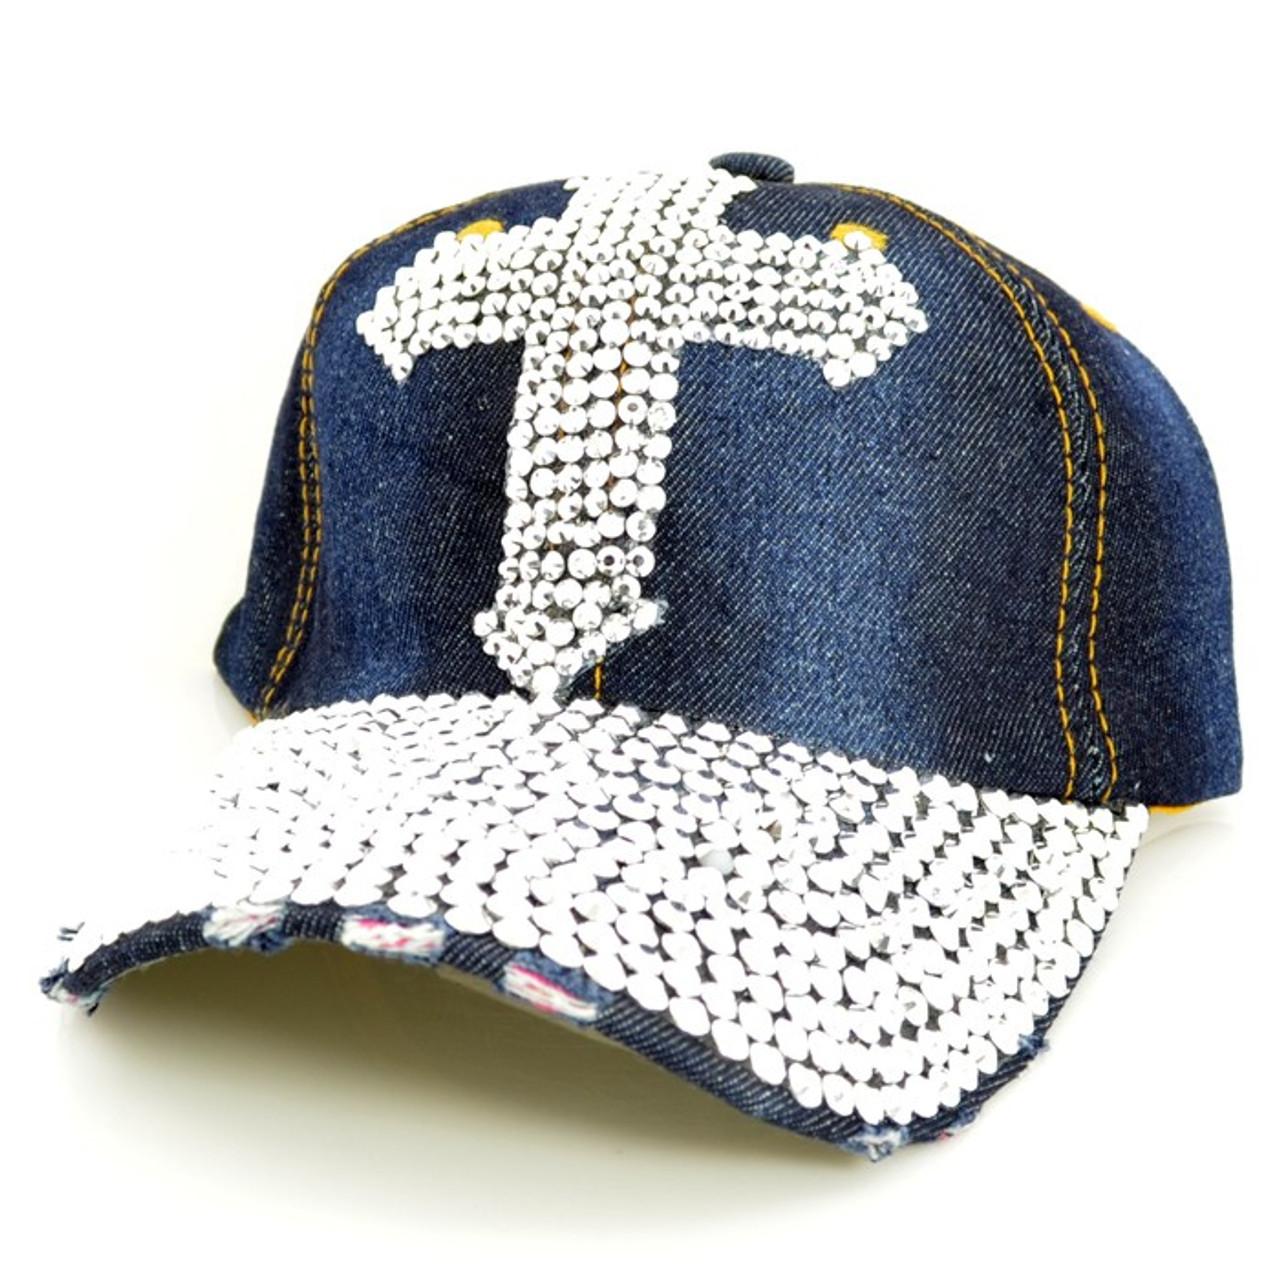 Navy Blue Jean cap with Rhinestone Cross - Shield of Faith Gifts 443d3987e18